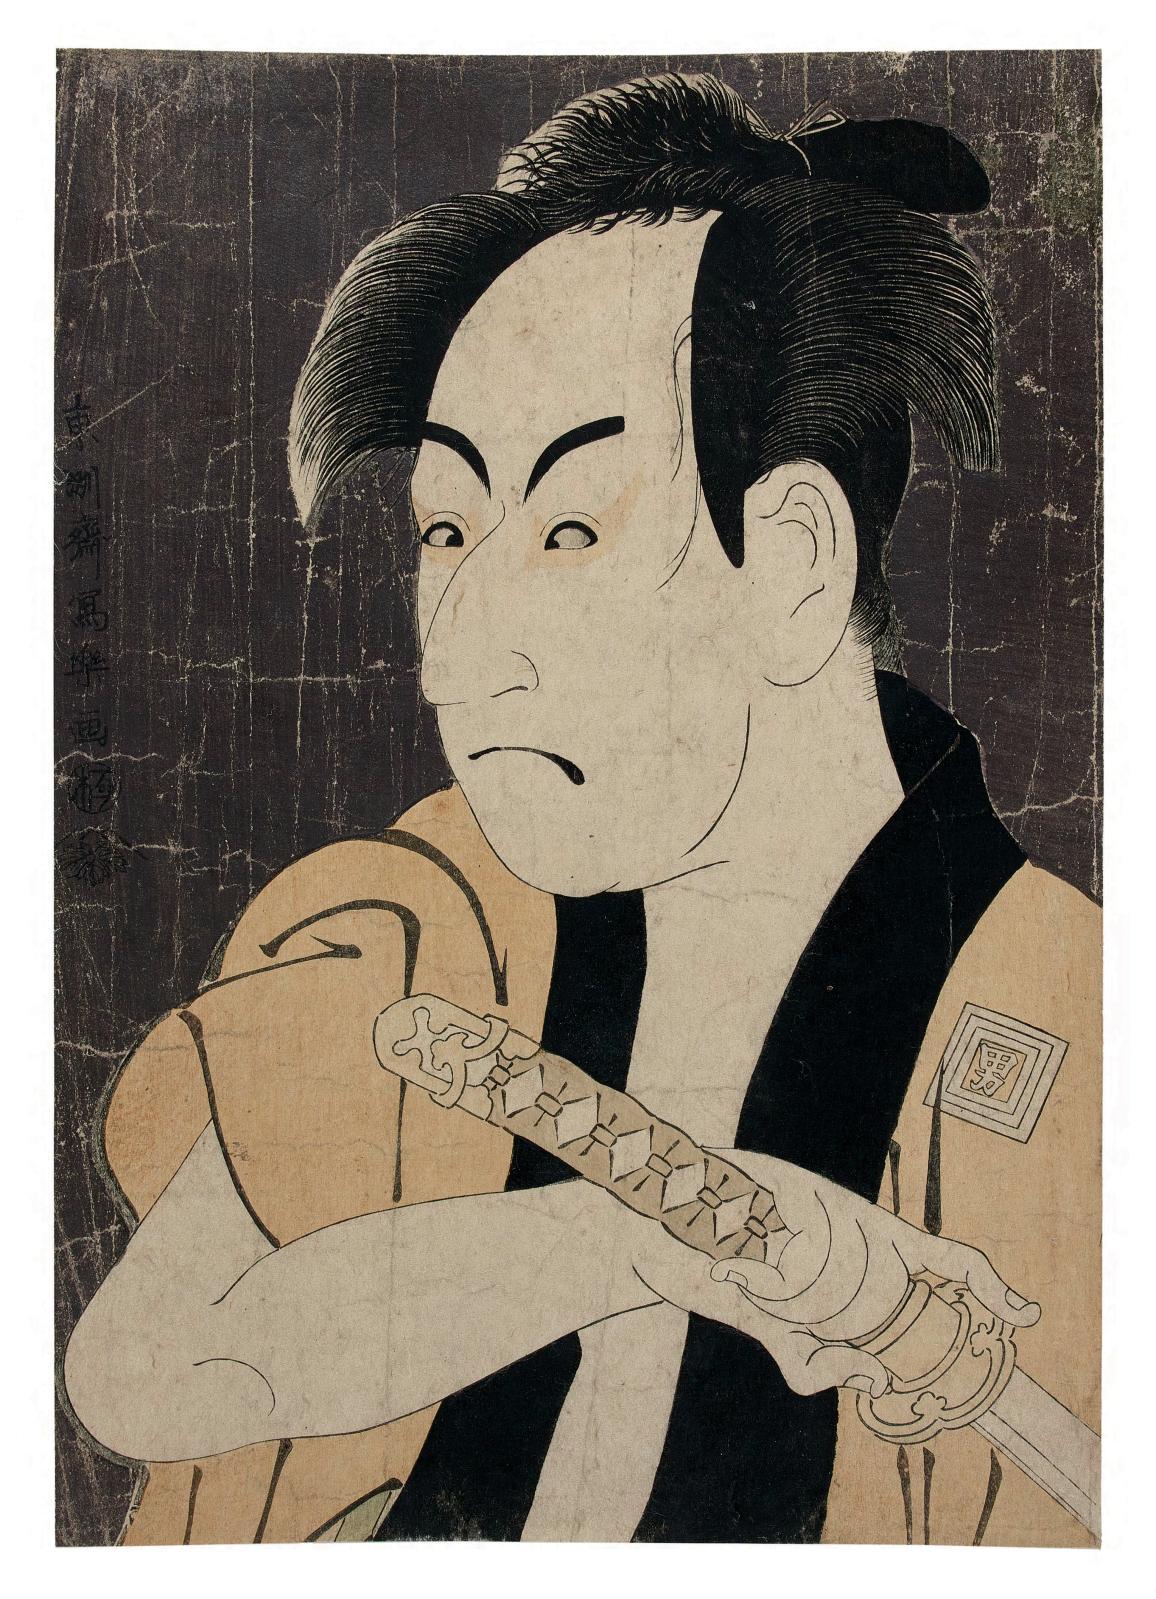 Toshusai Sharaku(actif 1794-1795), L'Acteur Ichikawa Omezô I dans le rôle du serviteur (yakko) Ippei, dans la pièce Koinyobo Somewake Tazuna (La noble